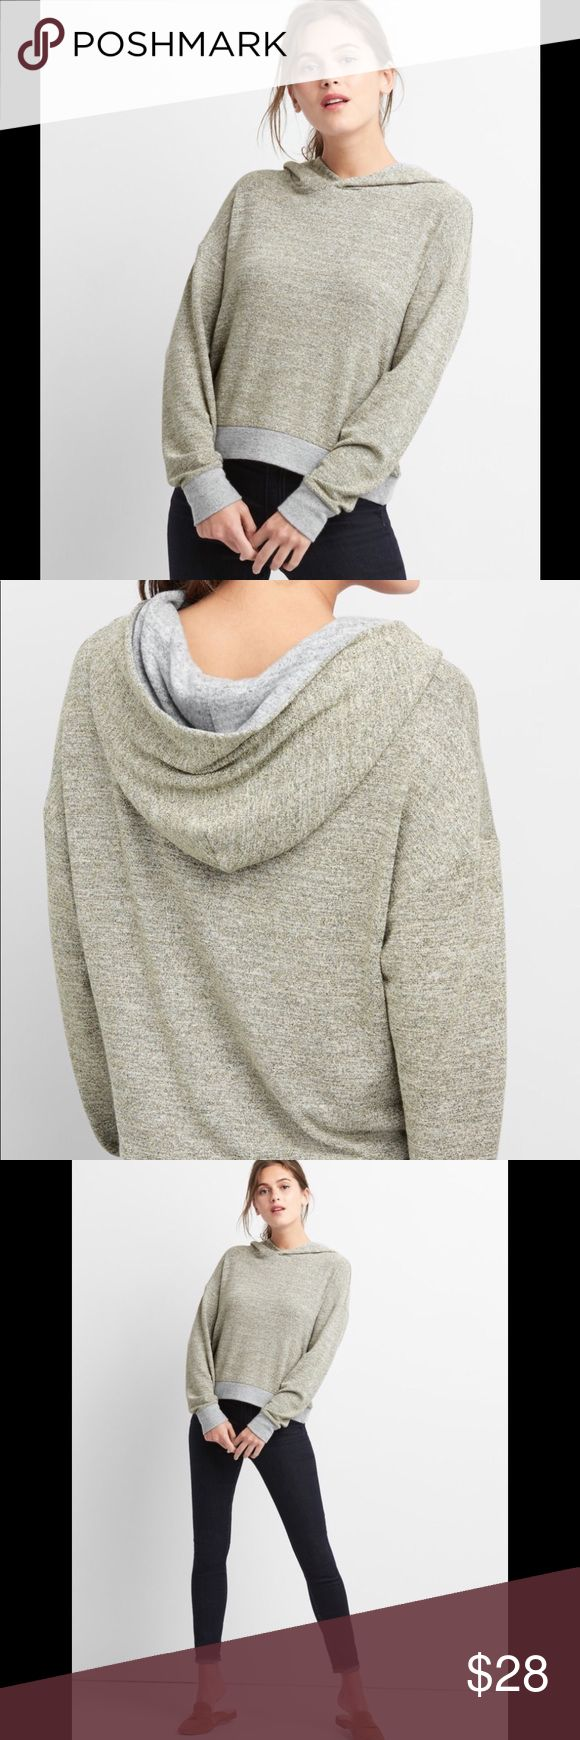 "🆕 GAP soft Spun Metallic Hoodie ! 🌺 GAP ! Soft spun metallic hoodie ! Soft jersey knit ! Dropped shoulders ! Long sleeves ! Hooded neckline ! Banded rib knit cuffs and hem ! Metallic detailing throughout ! Color "" Heather Grey "" ! I Love mine ! 5⭐️ On GAP ! 🌺 GAP Tops Sweatshirts & Hoodies"